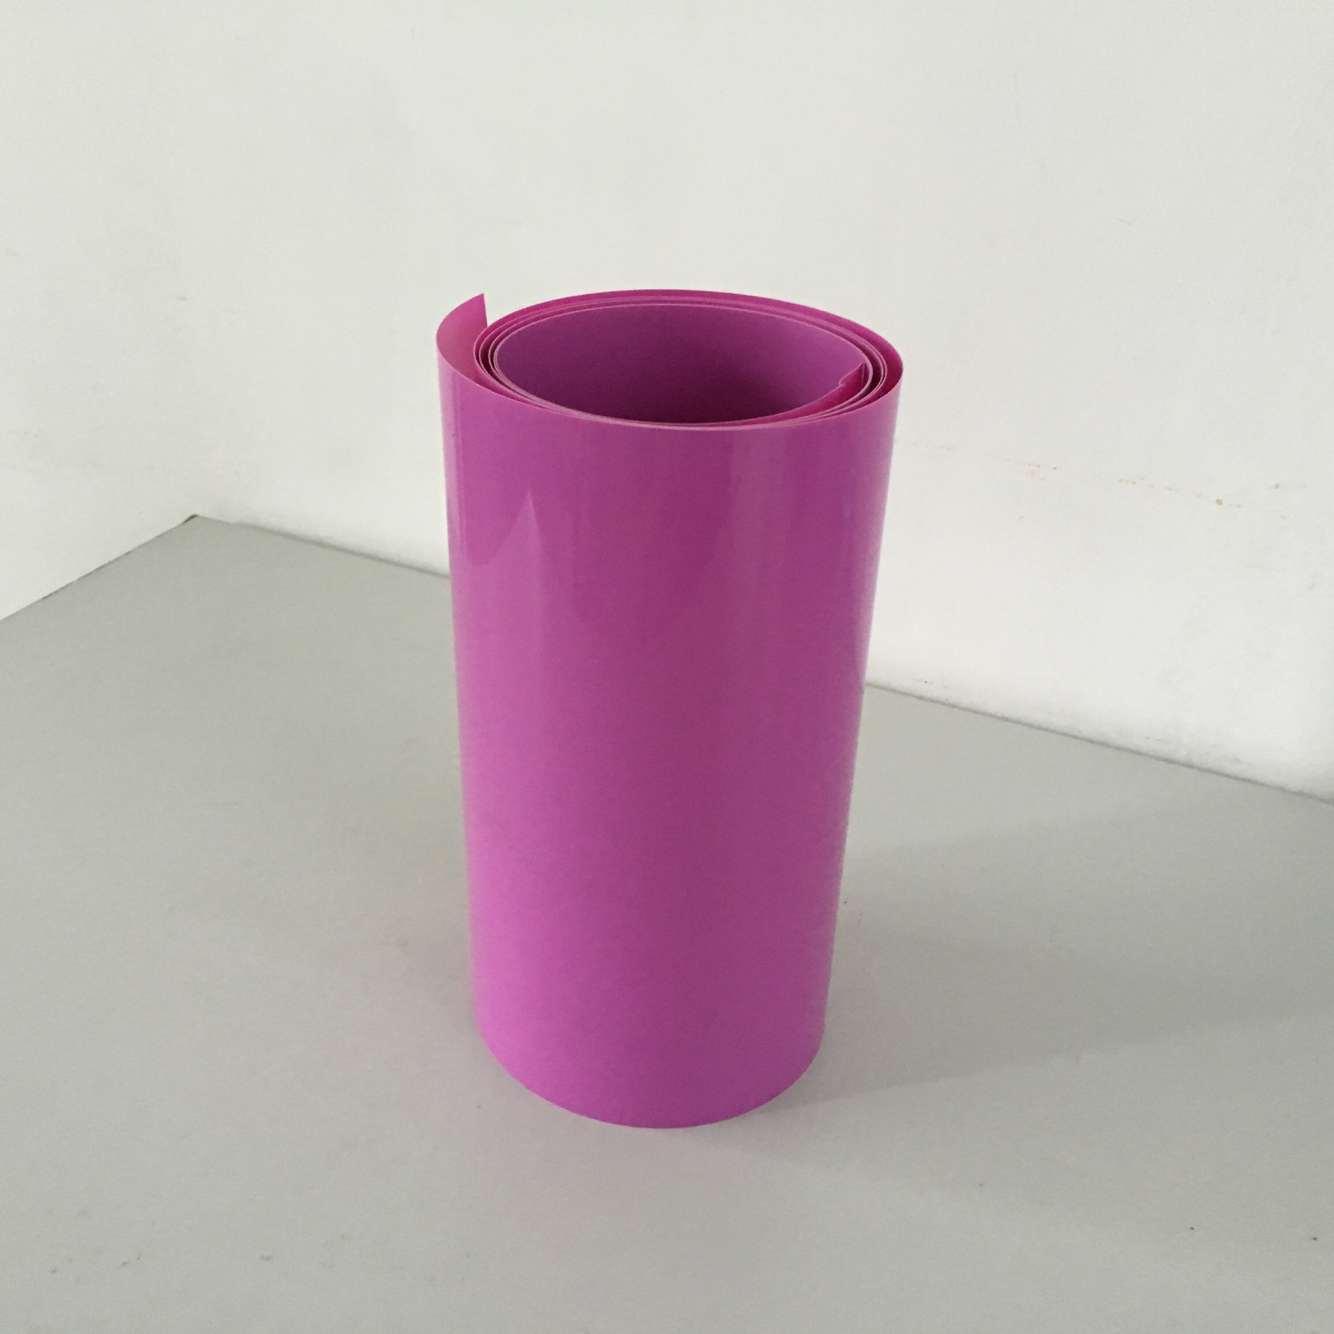 Virgin Transparent PVC Calender Rigid Film for Pharmaceutical Packing